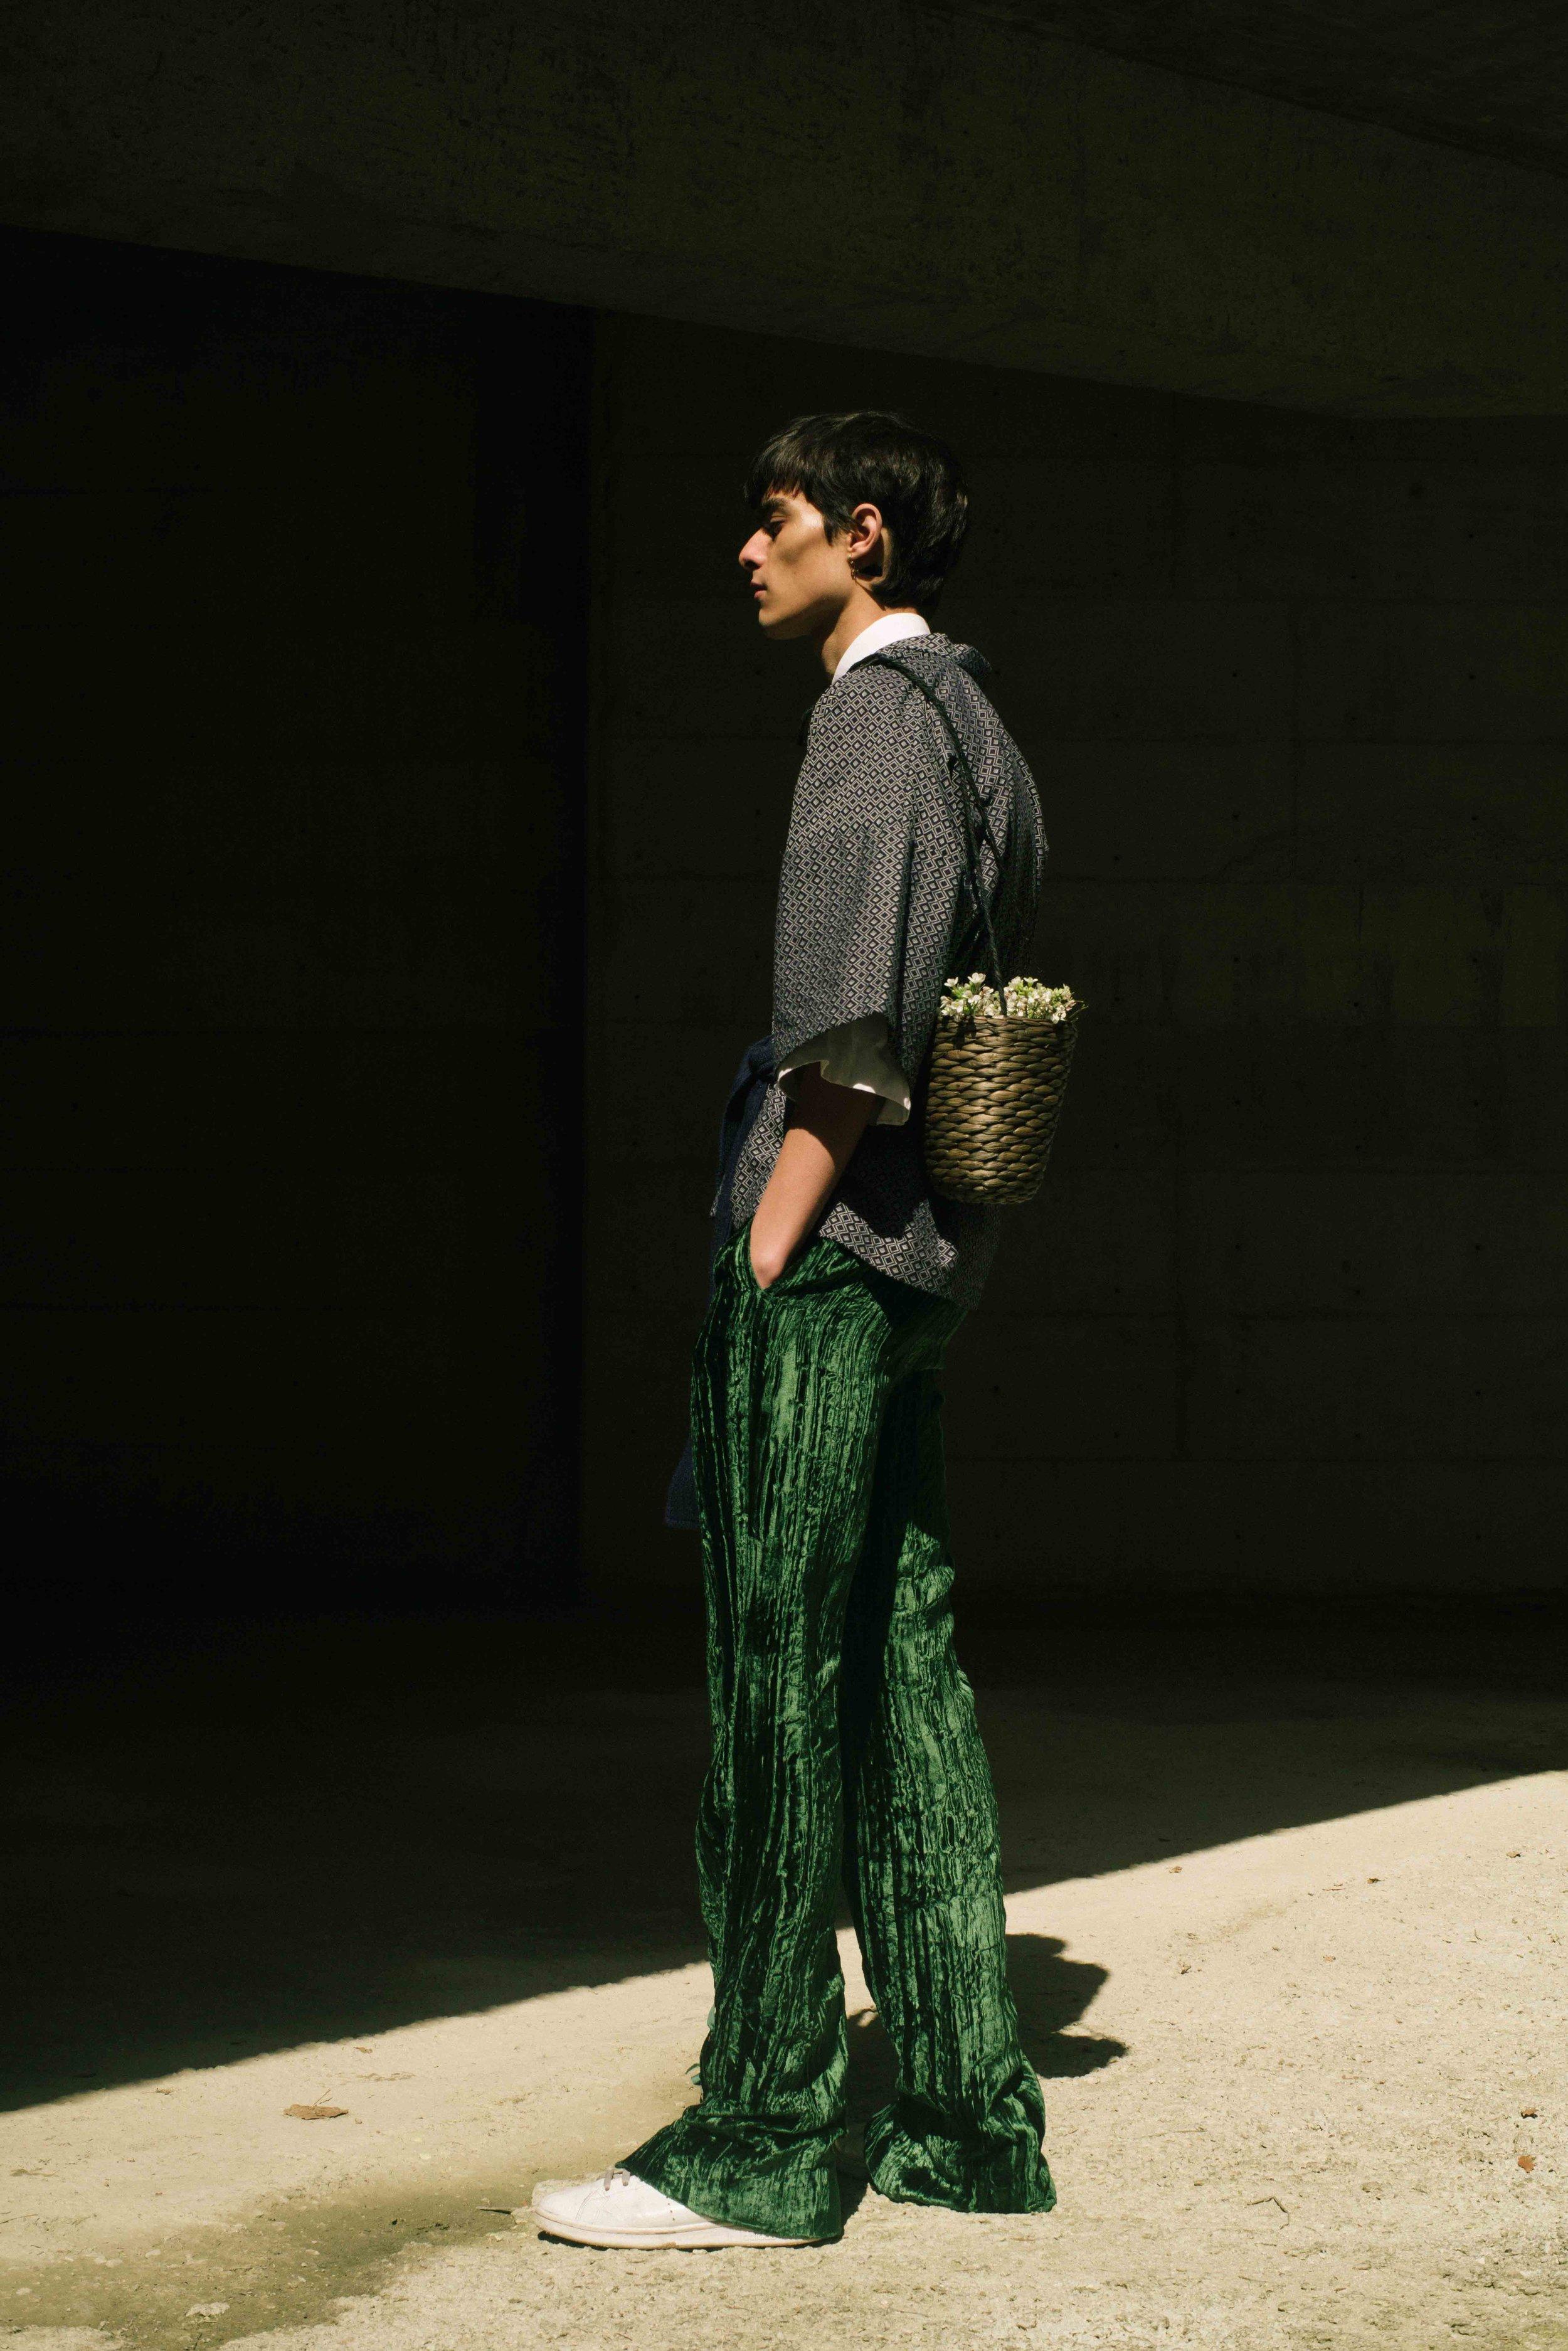 Kimono  YELLOW STUDIO  Shirt  ACNE STUDIOS  Velvet Trousers  DELADA  Basket  Stylist's Own